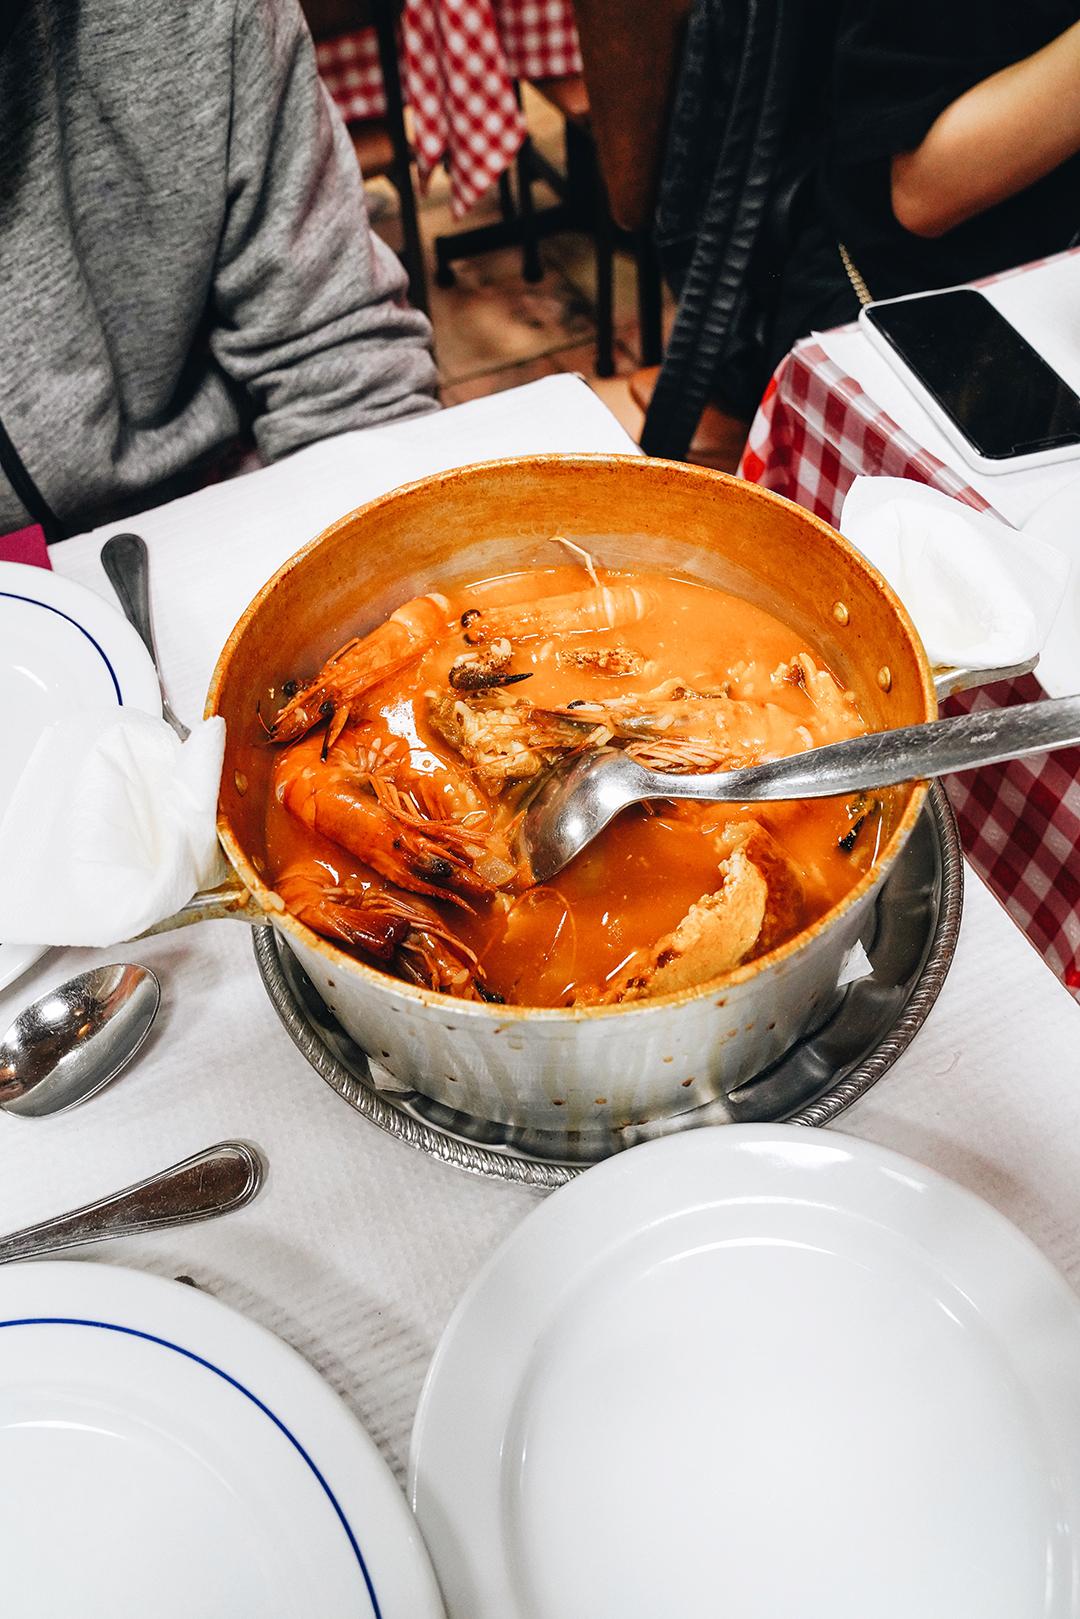 Seafood rice (해물밥)